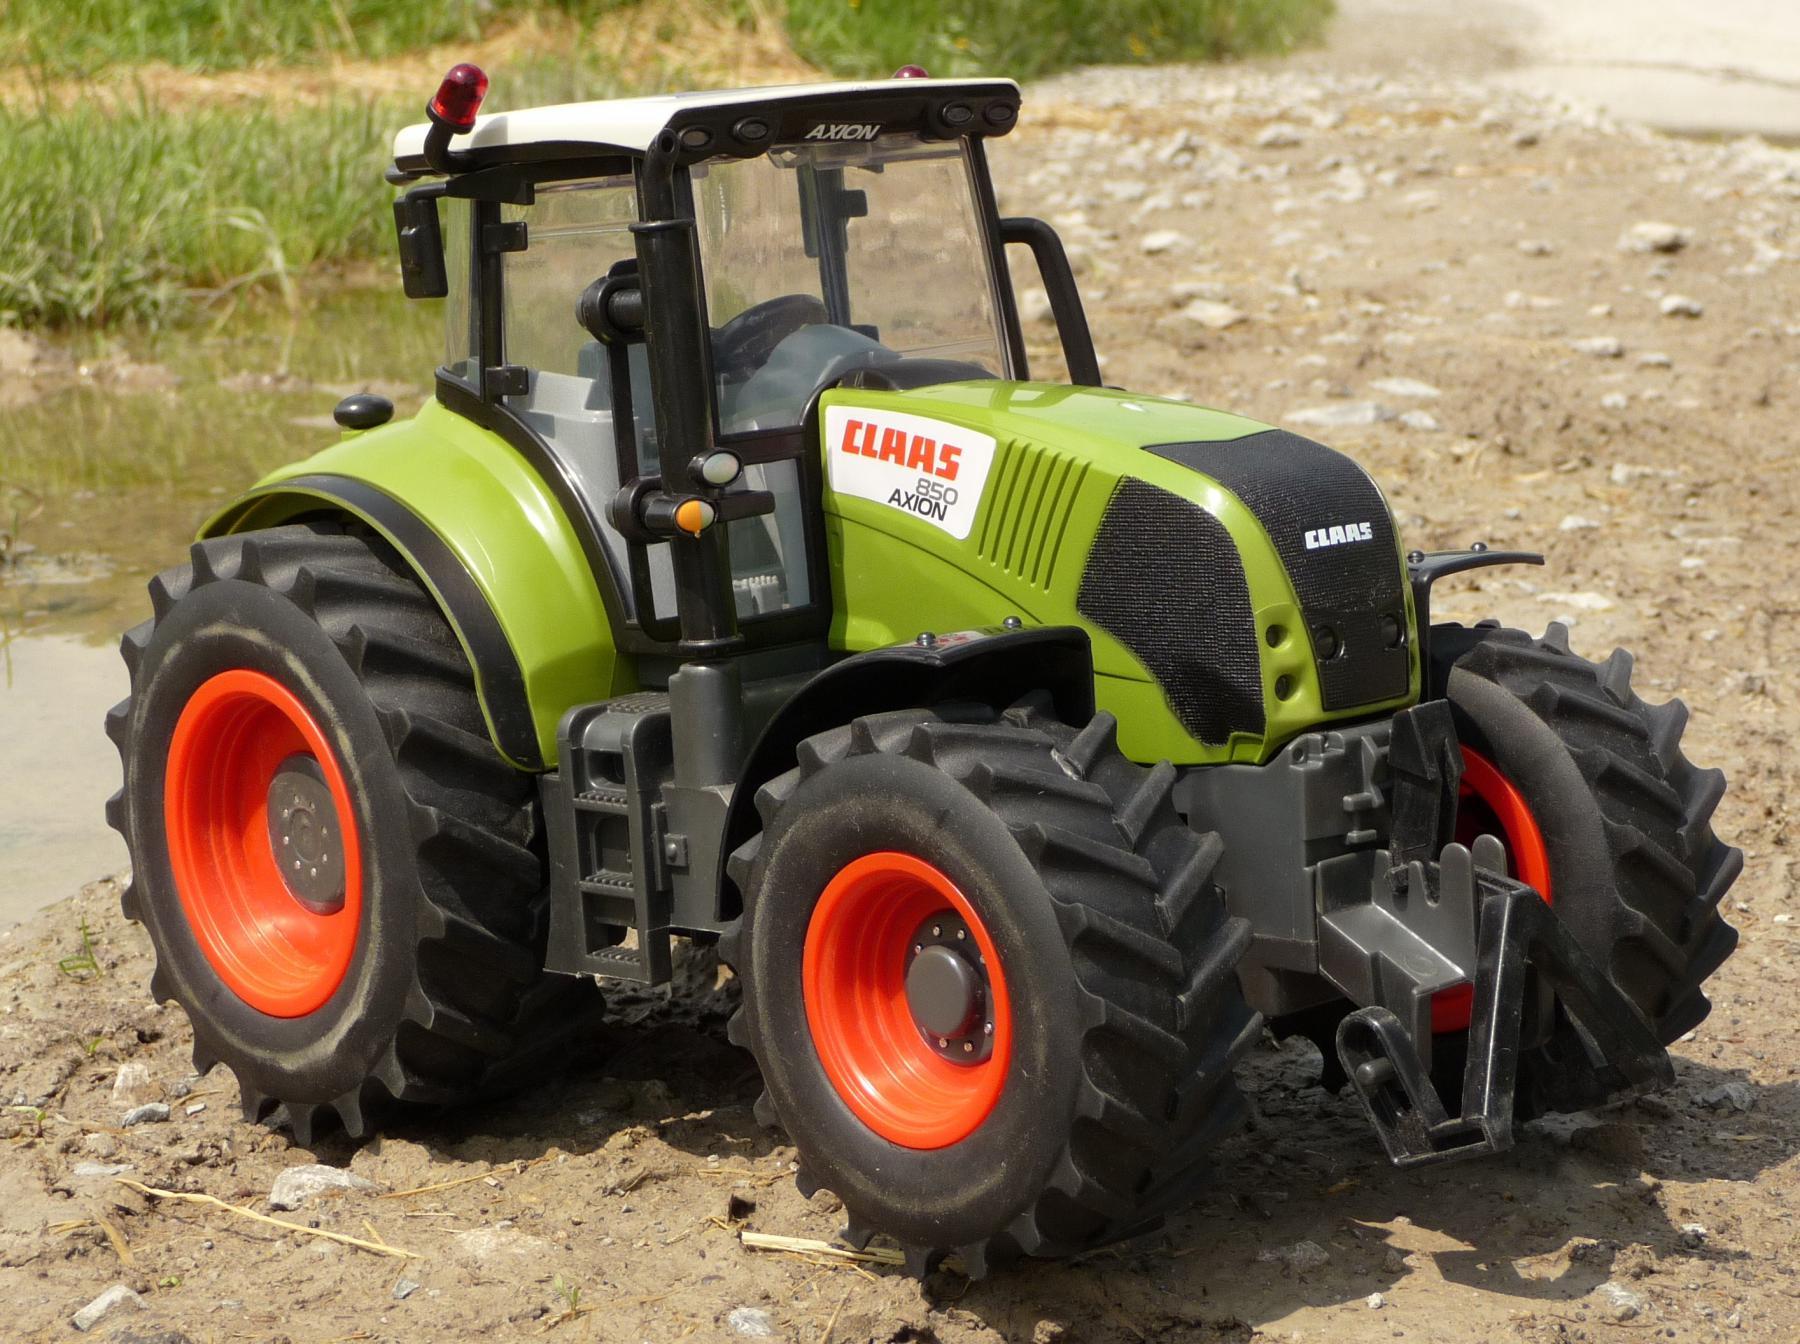 rc traktor claas axion 870 in xl gr e 35cm ferngesteuert. Black Bedroom Furniture Sets. Home Design Ideas